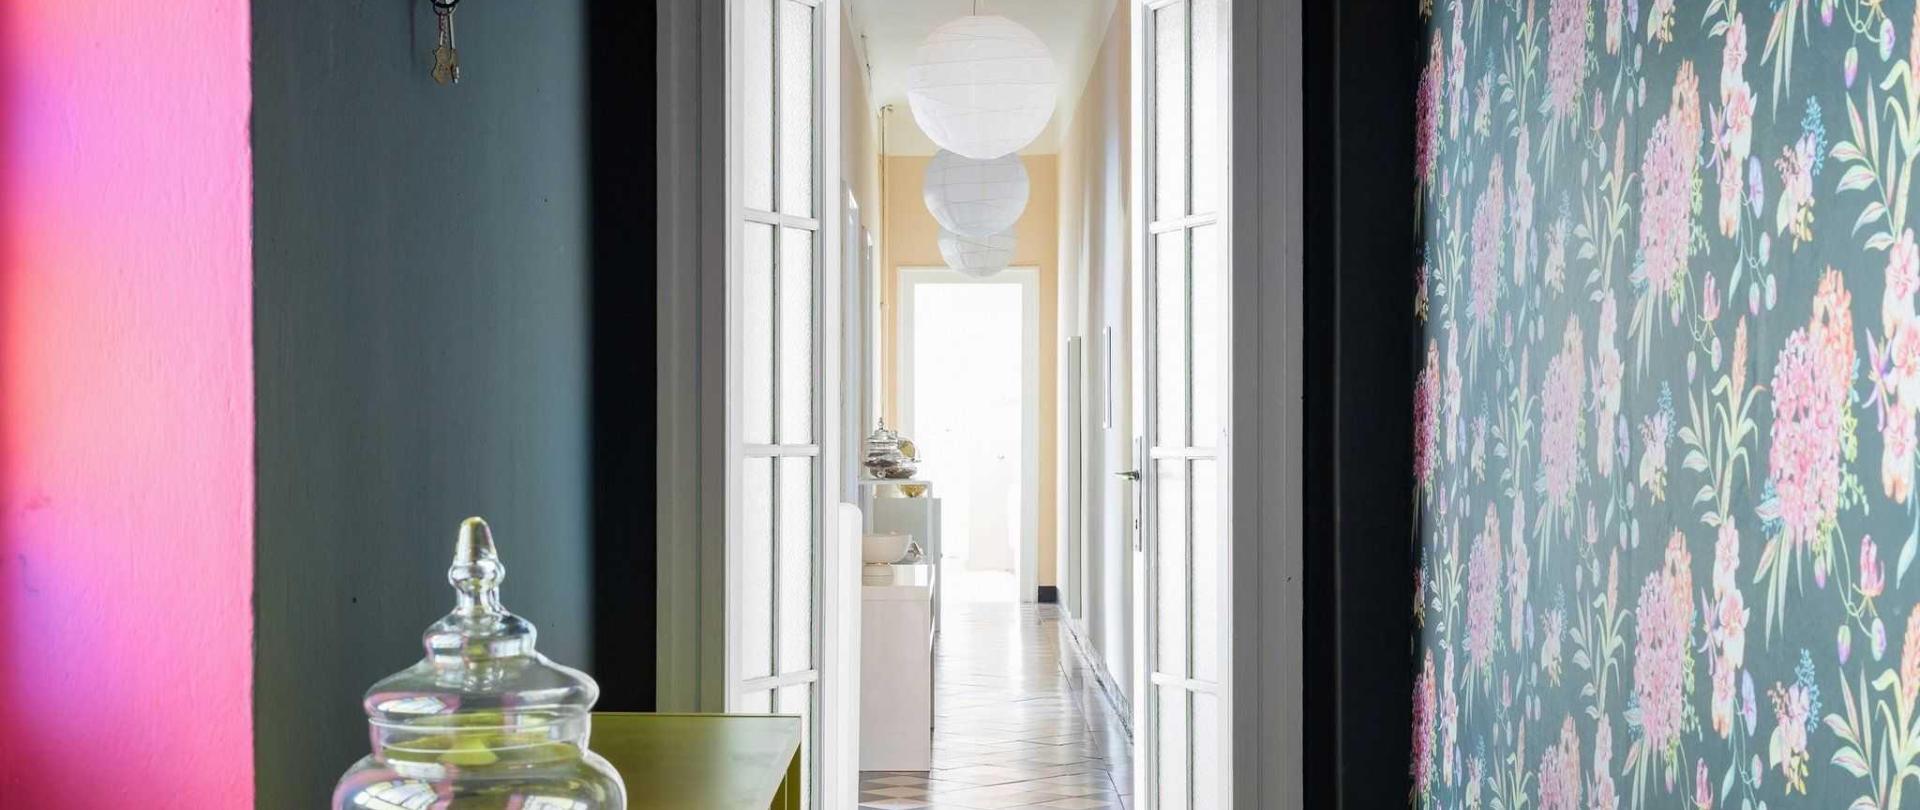 House corridor.jpg